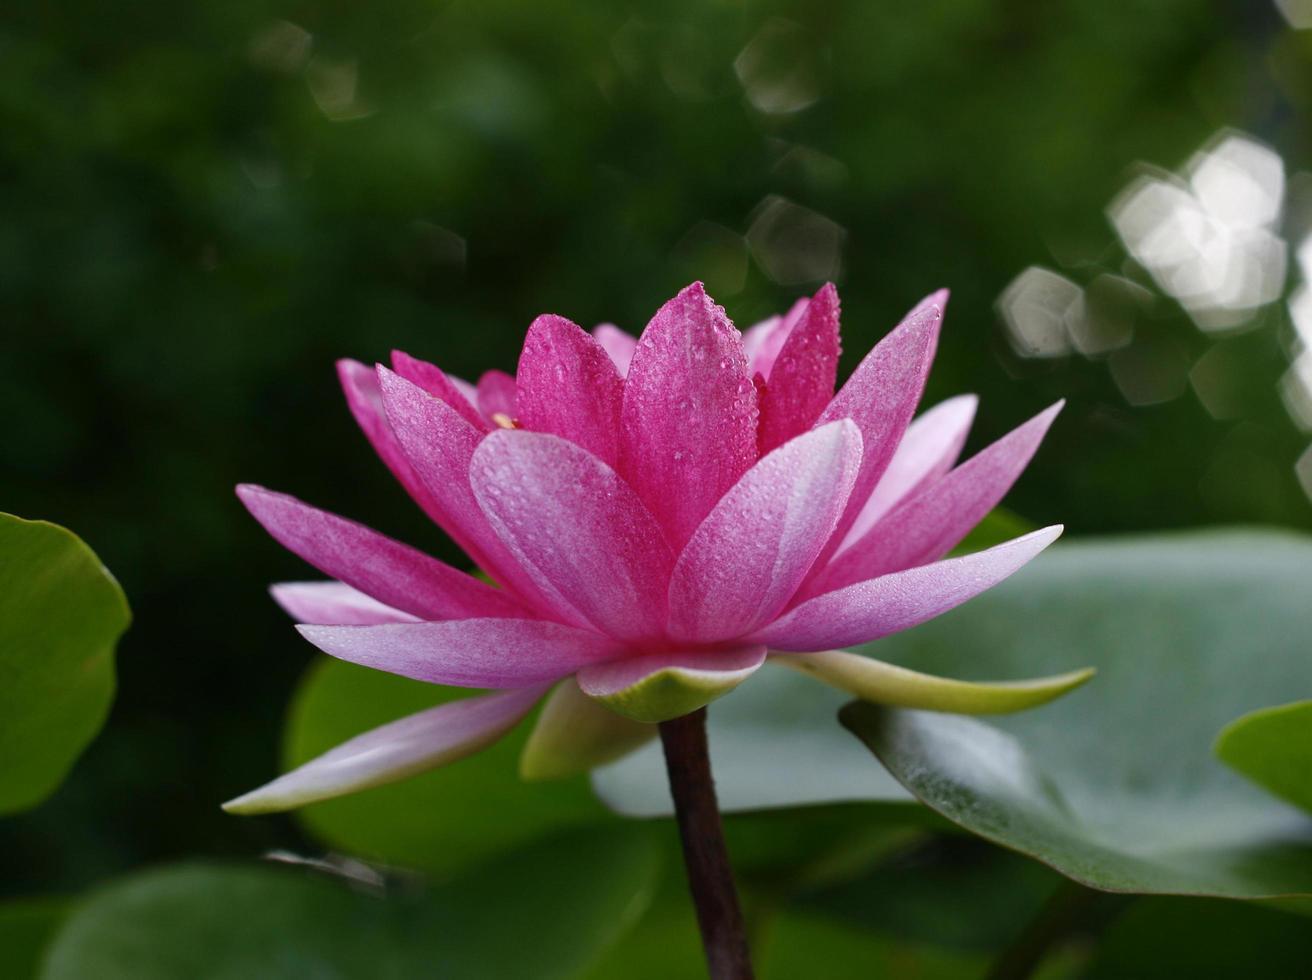 rosa Lotusblume draußen foto